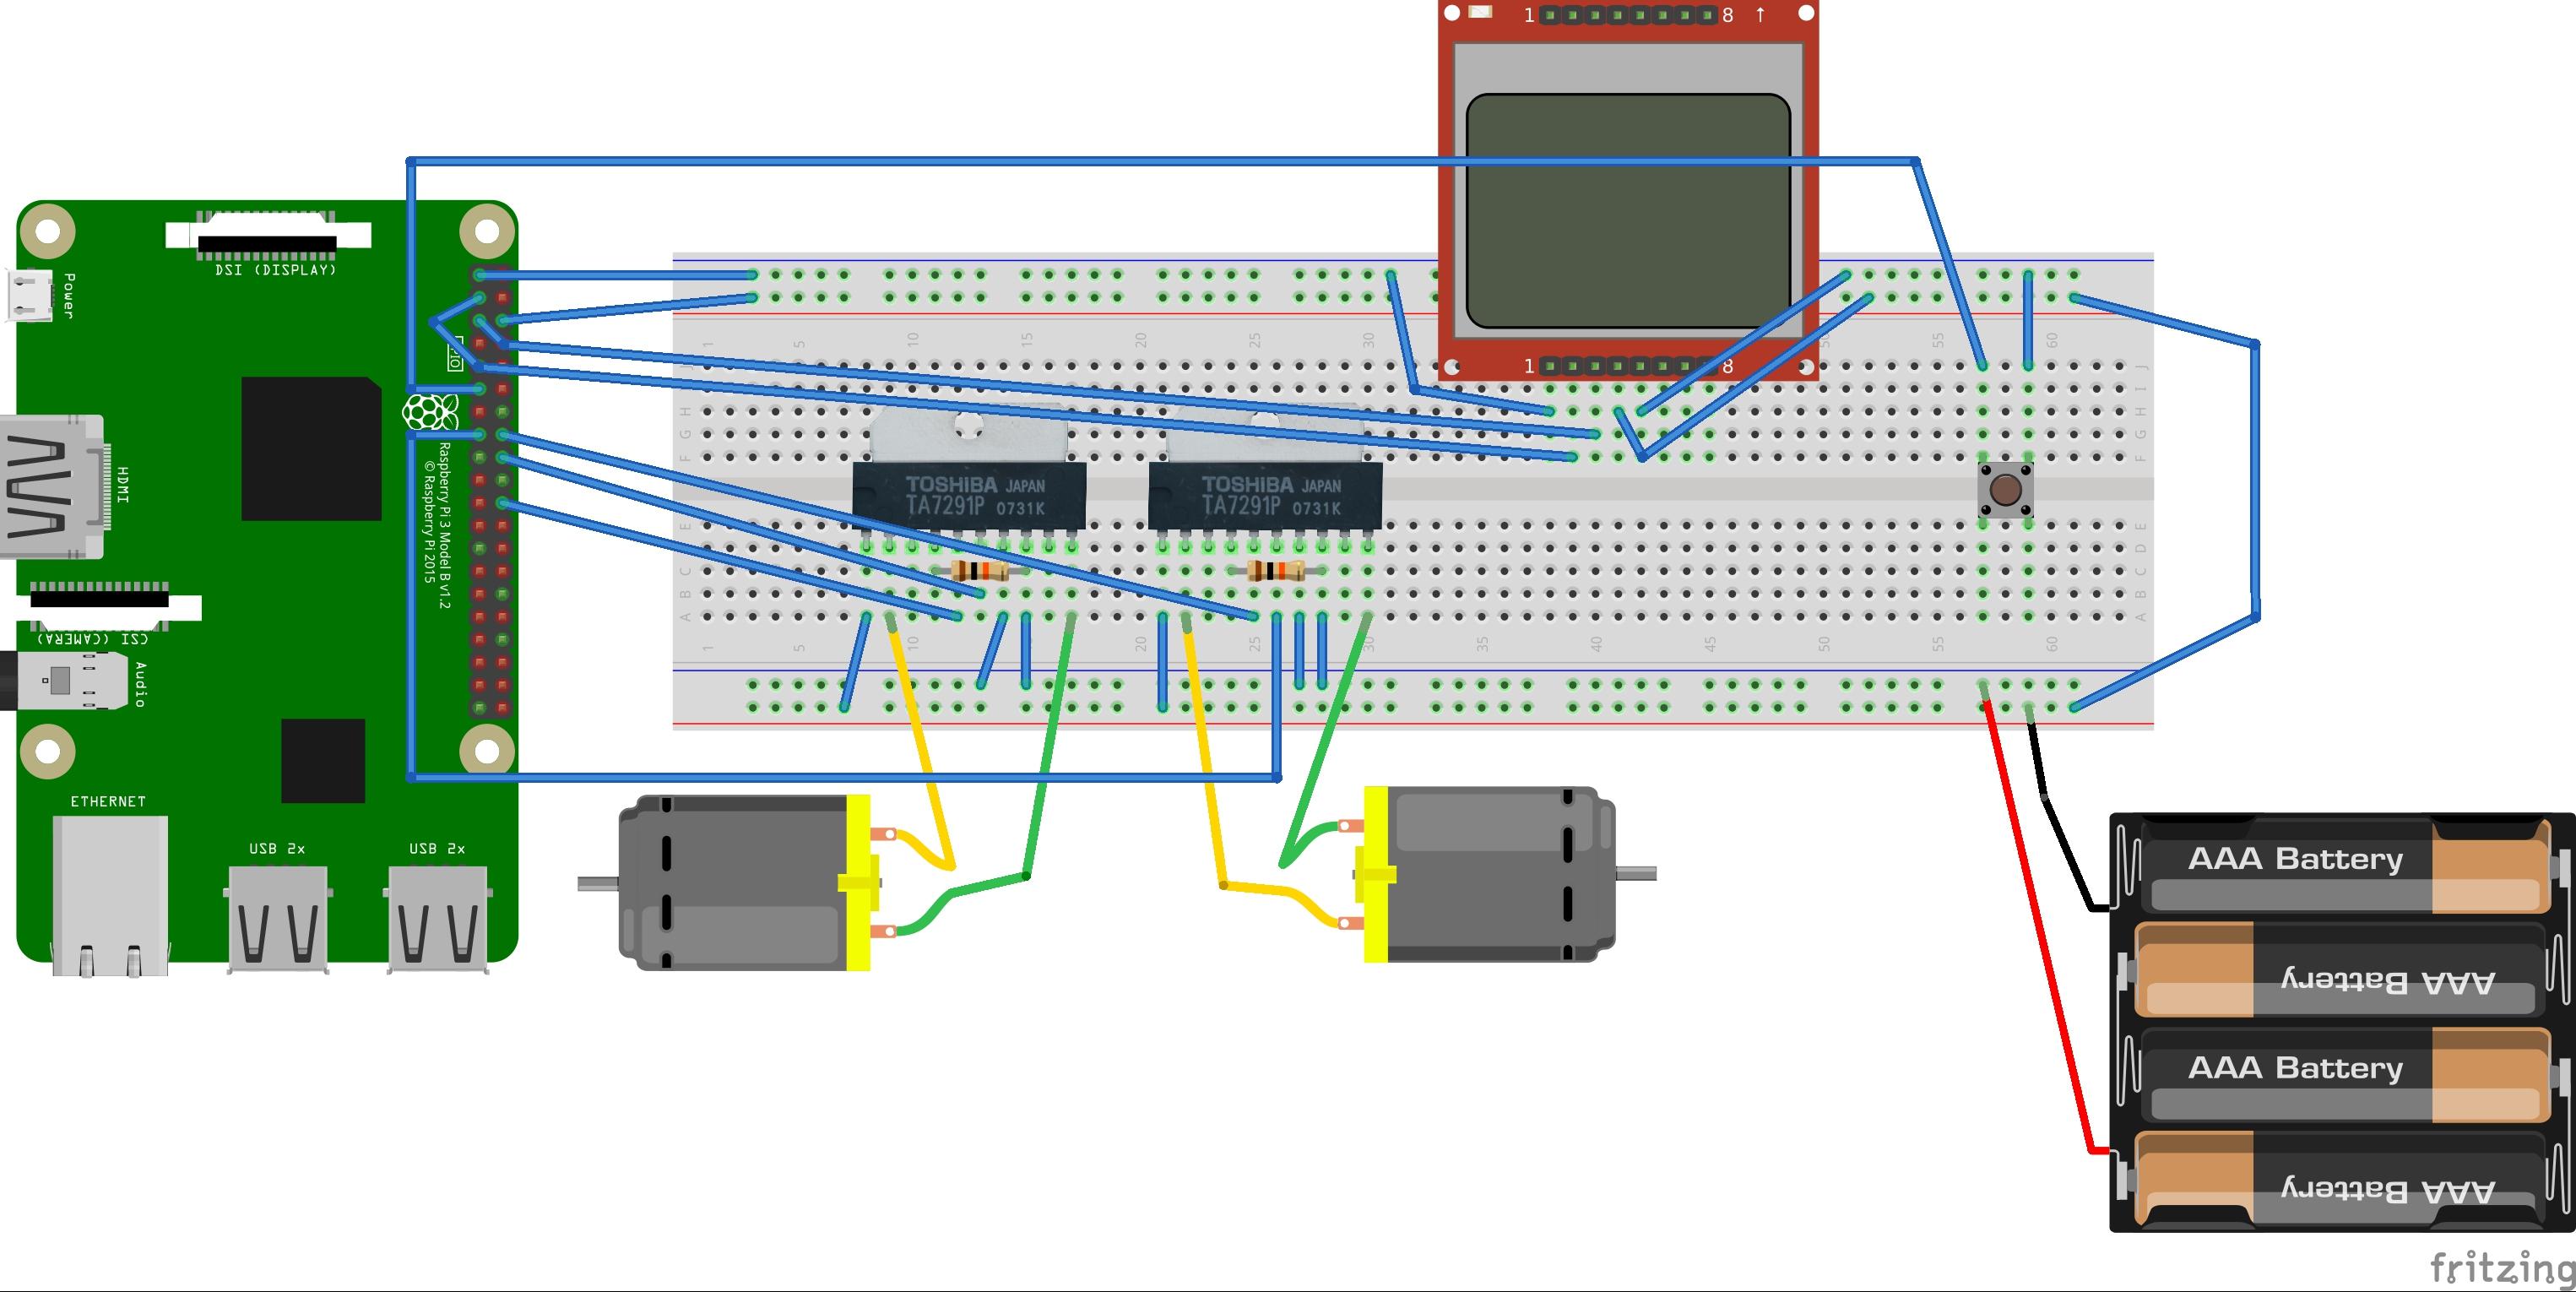 raspi-radiocontrol_ブレッドボード.jpg